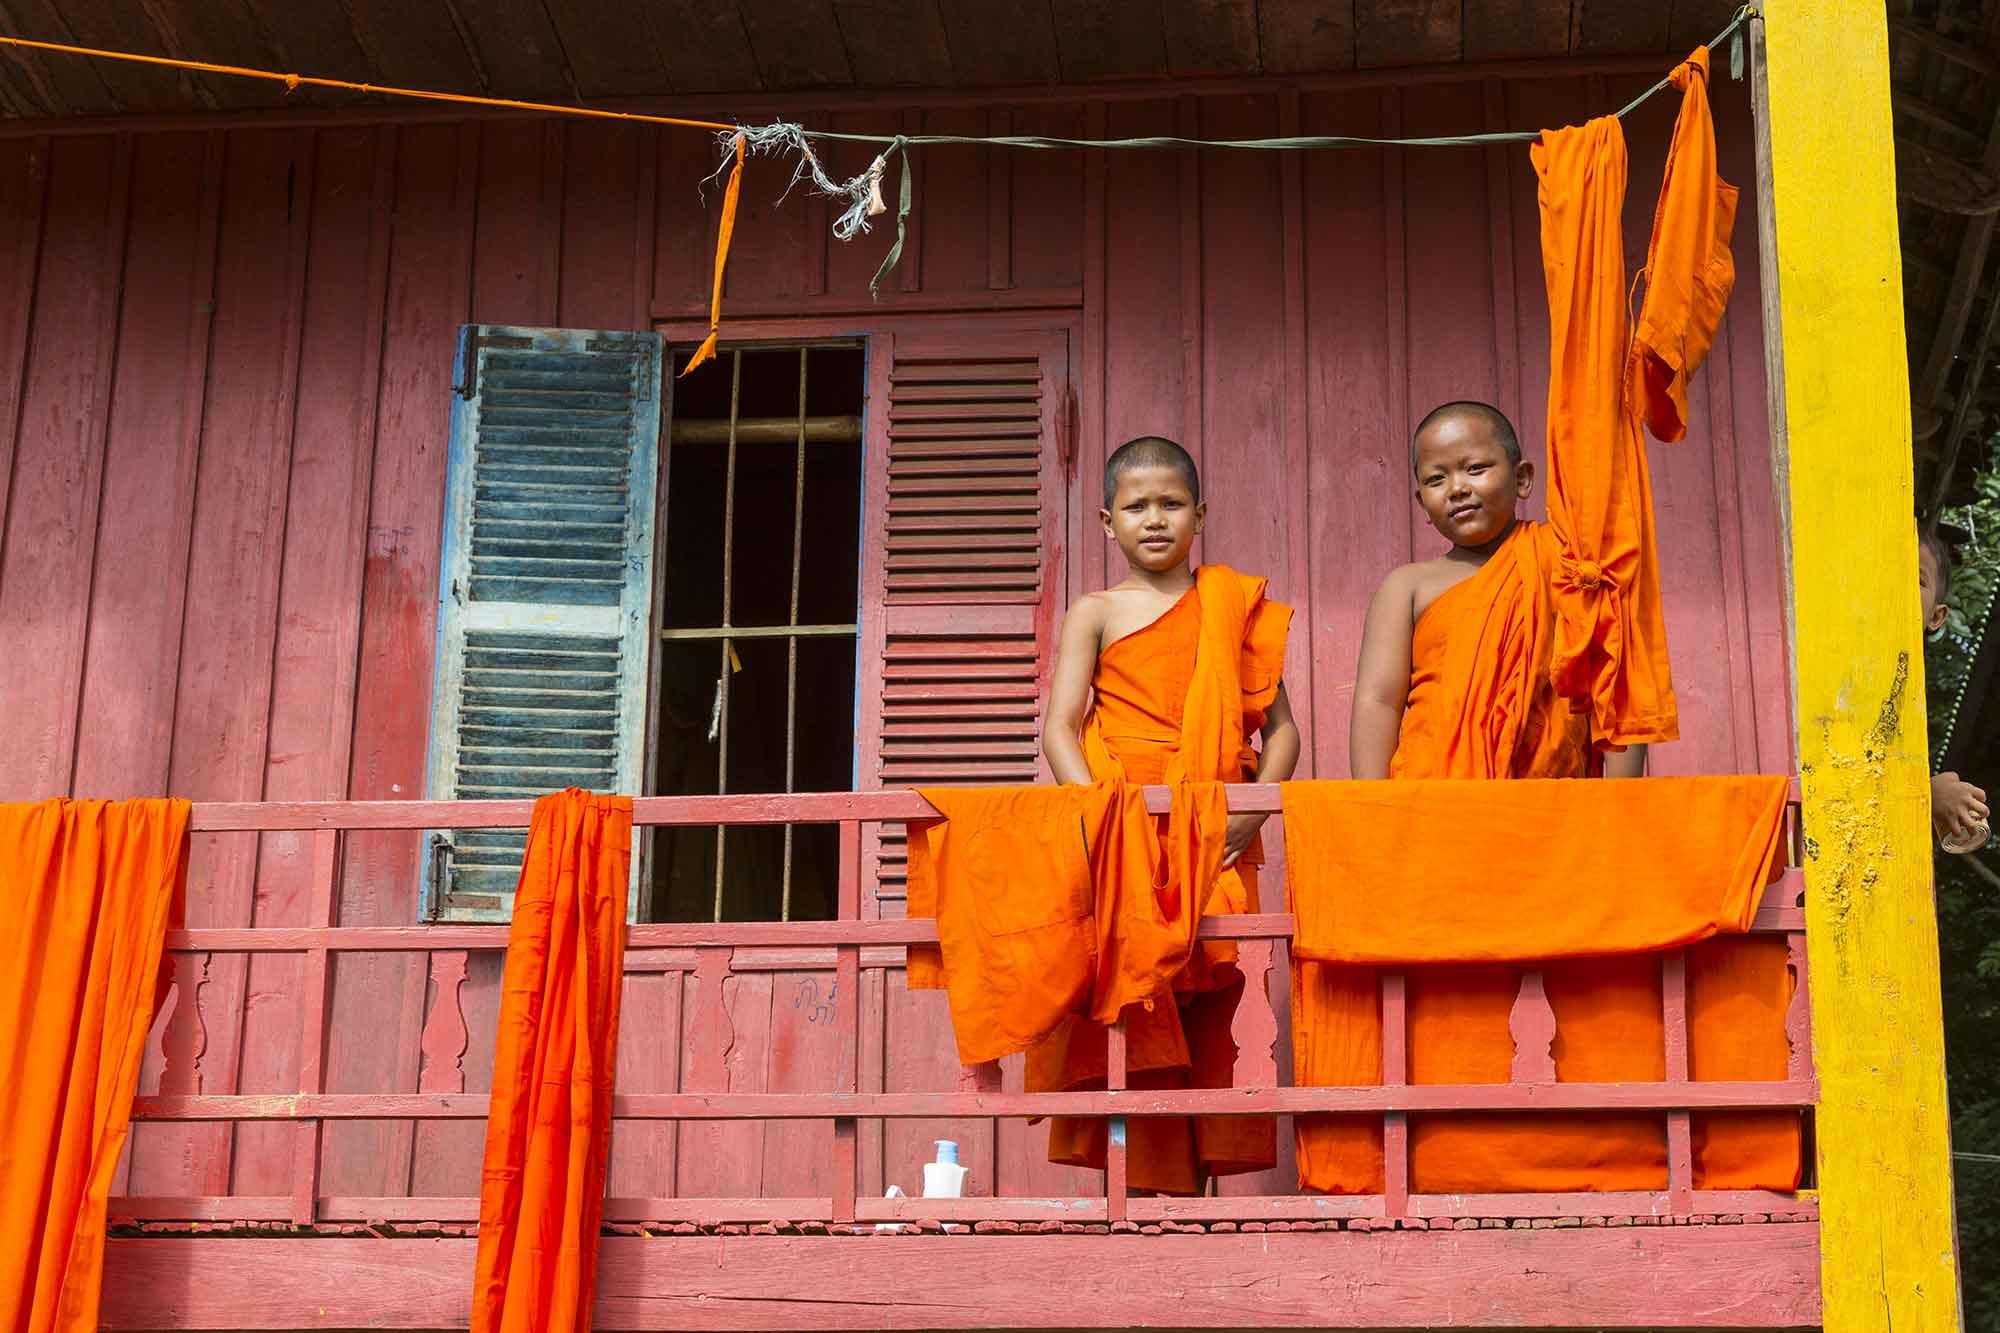 Famille CHAPUY – Cambodge rapide – Octobre 2012 (5 jours)